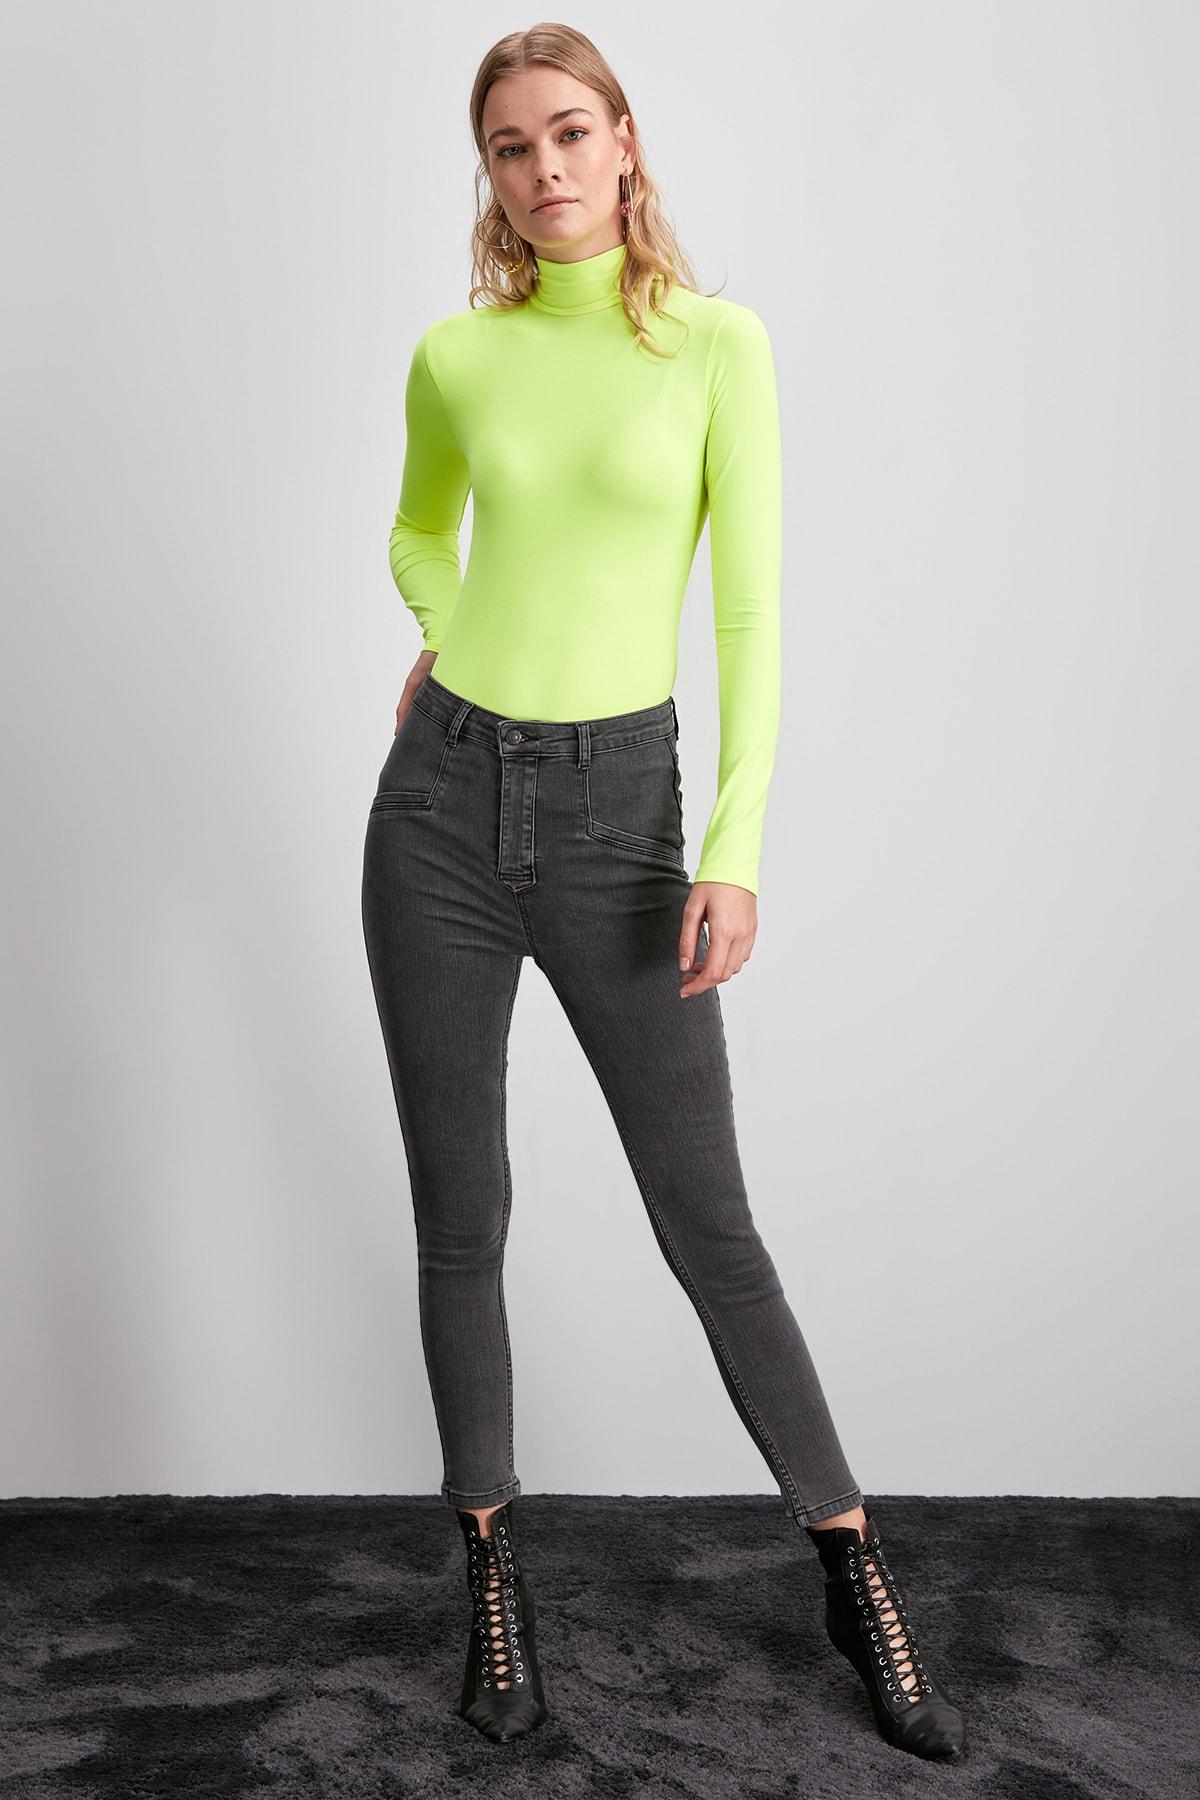 Trendyol Stitch Detail High Waist Jegging Jeans TWOAW20JE0305